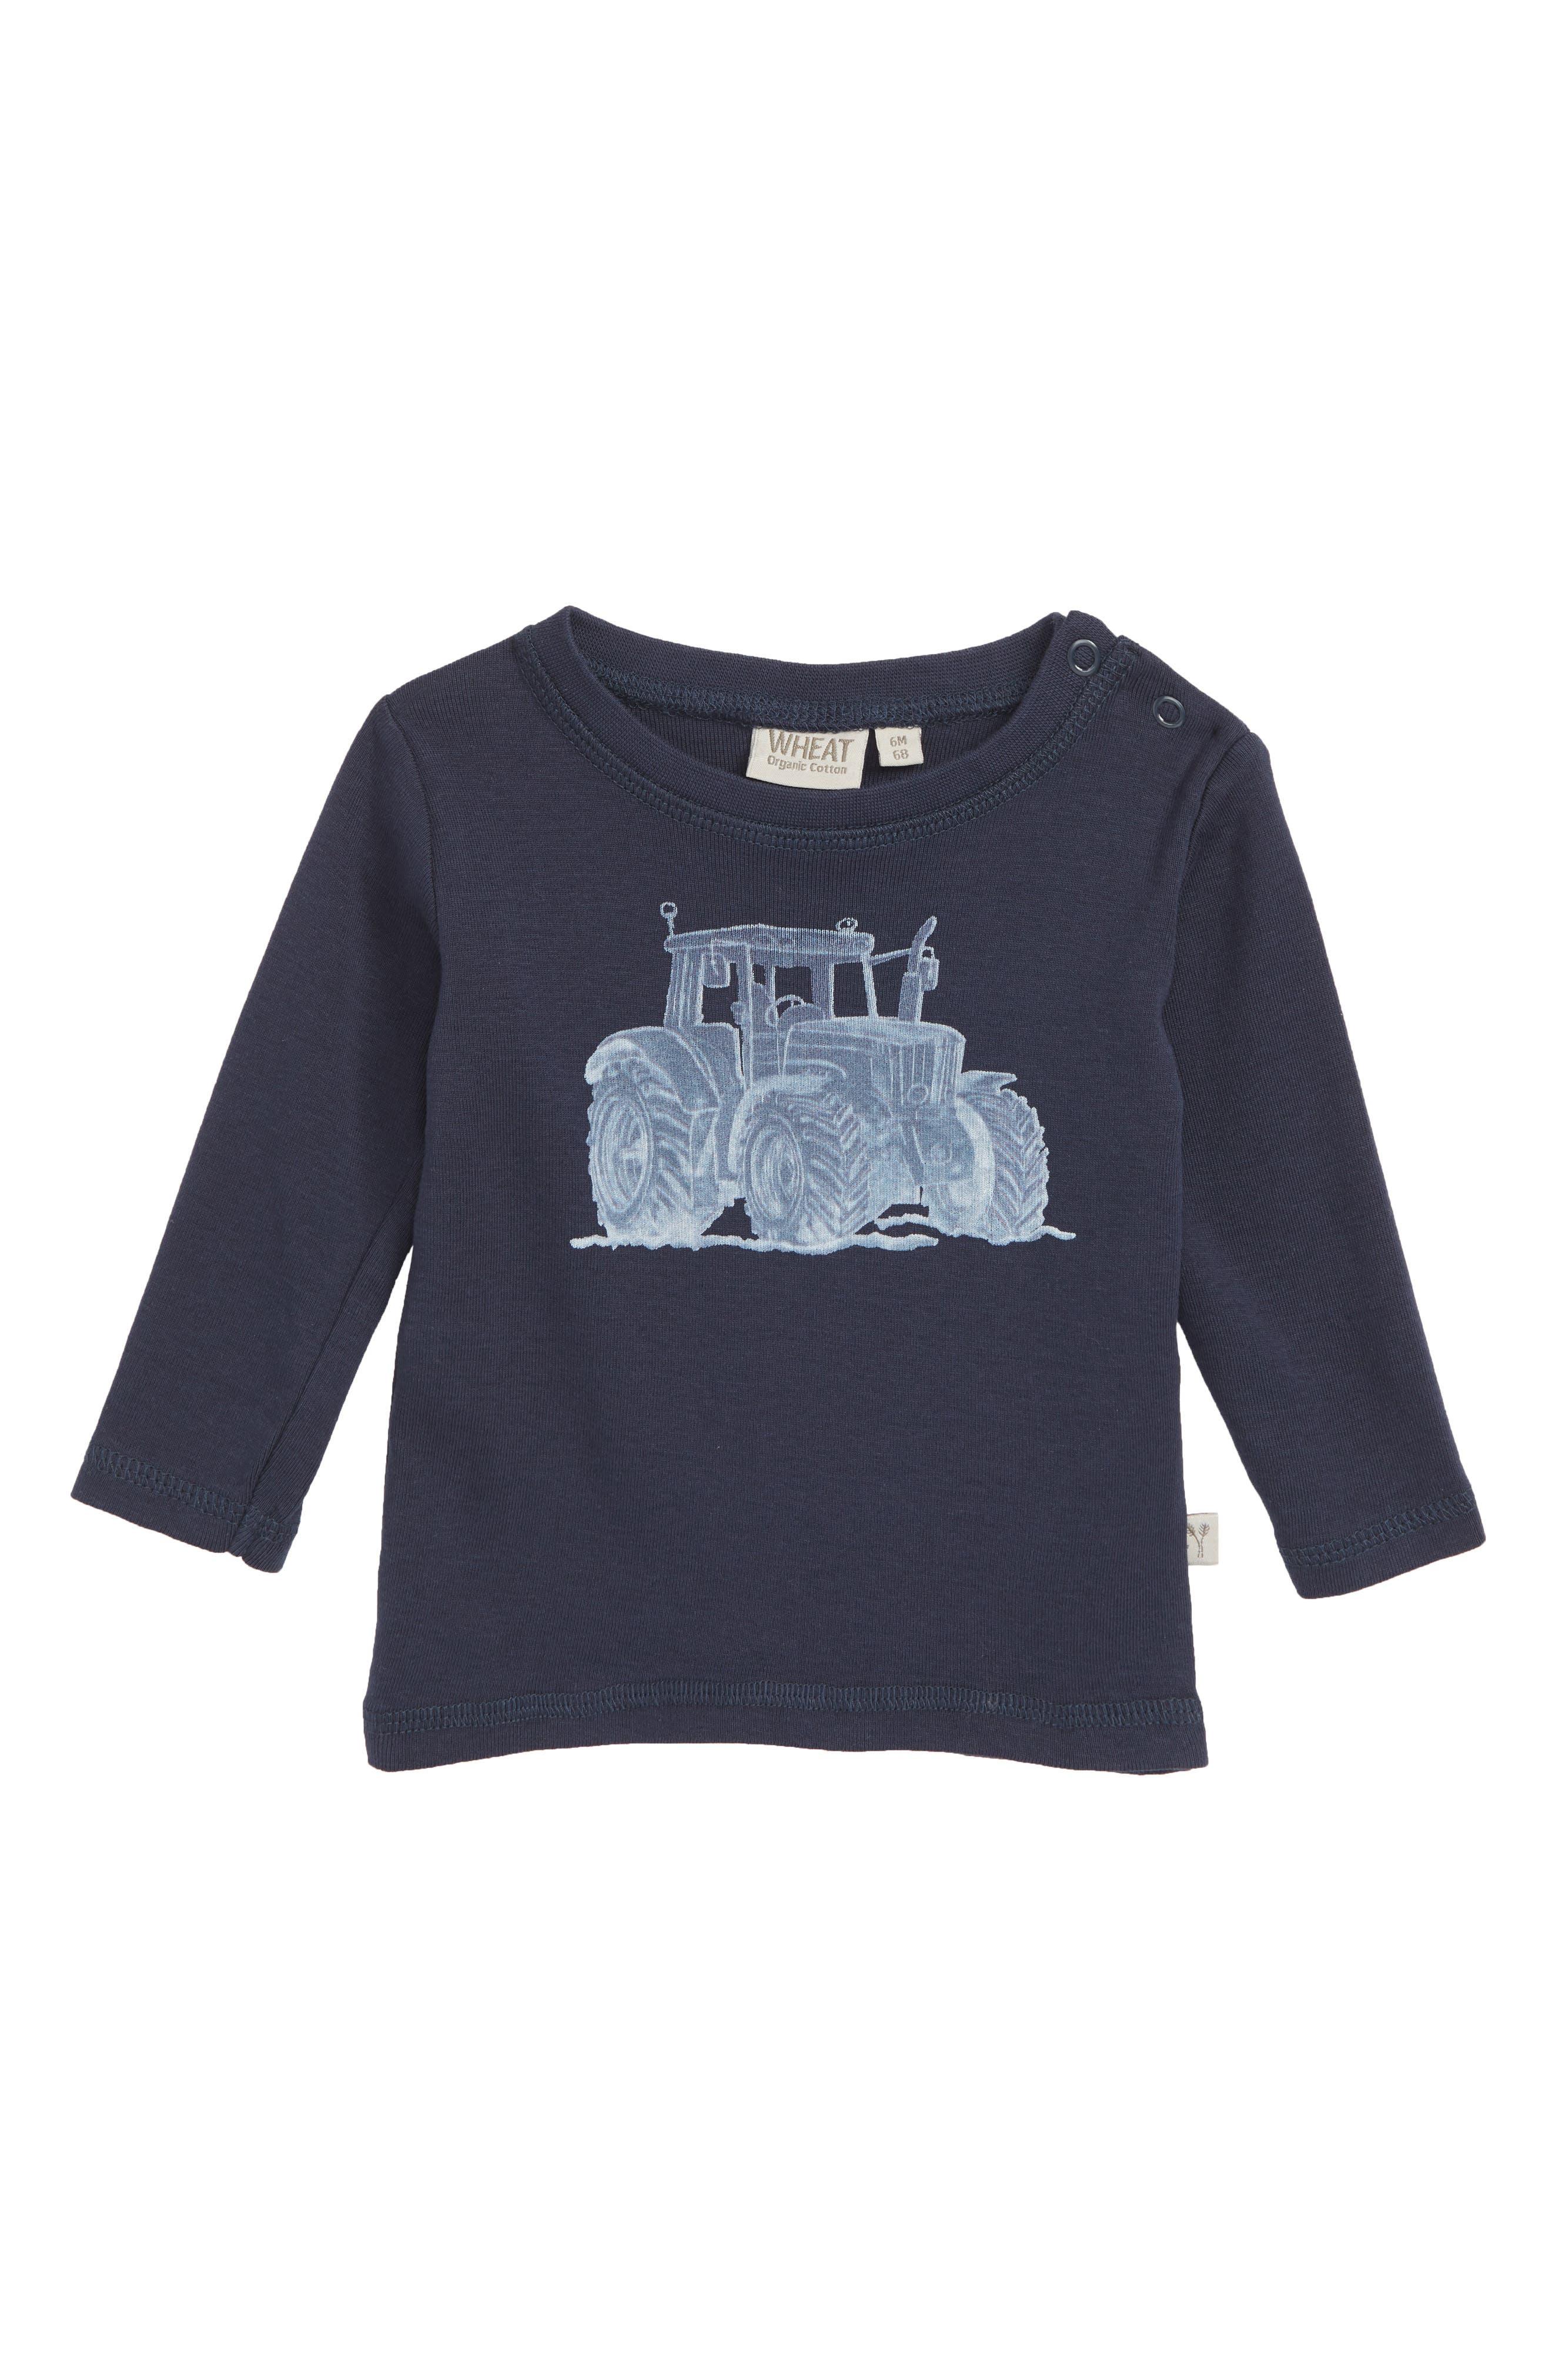 WHEAT,                             Tractor Organic Cotton T-Shirt,                             Main thumbnail 1, color,                             NAVY